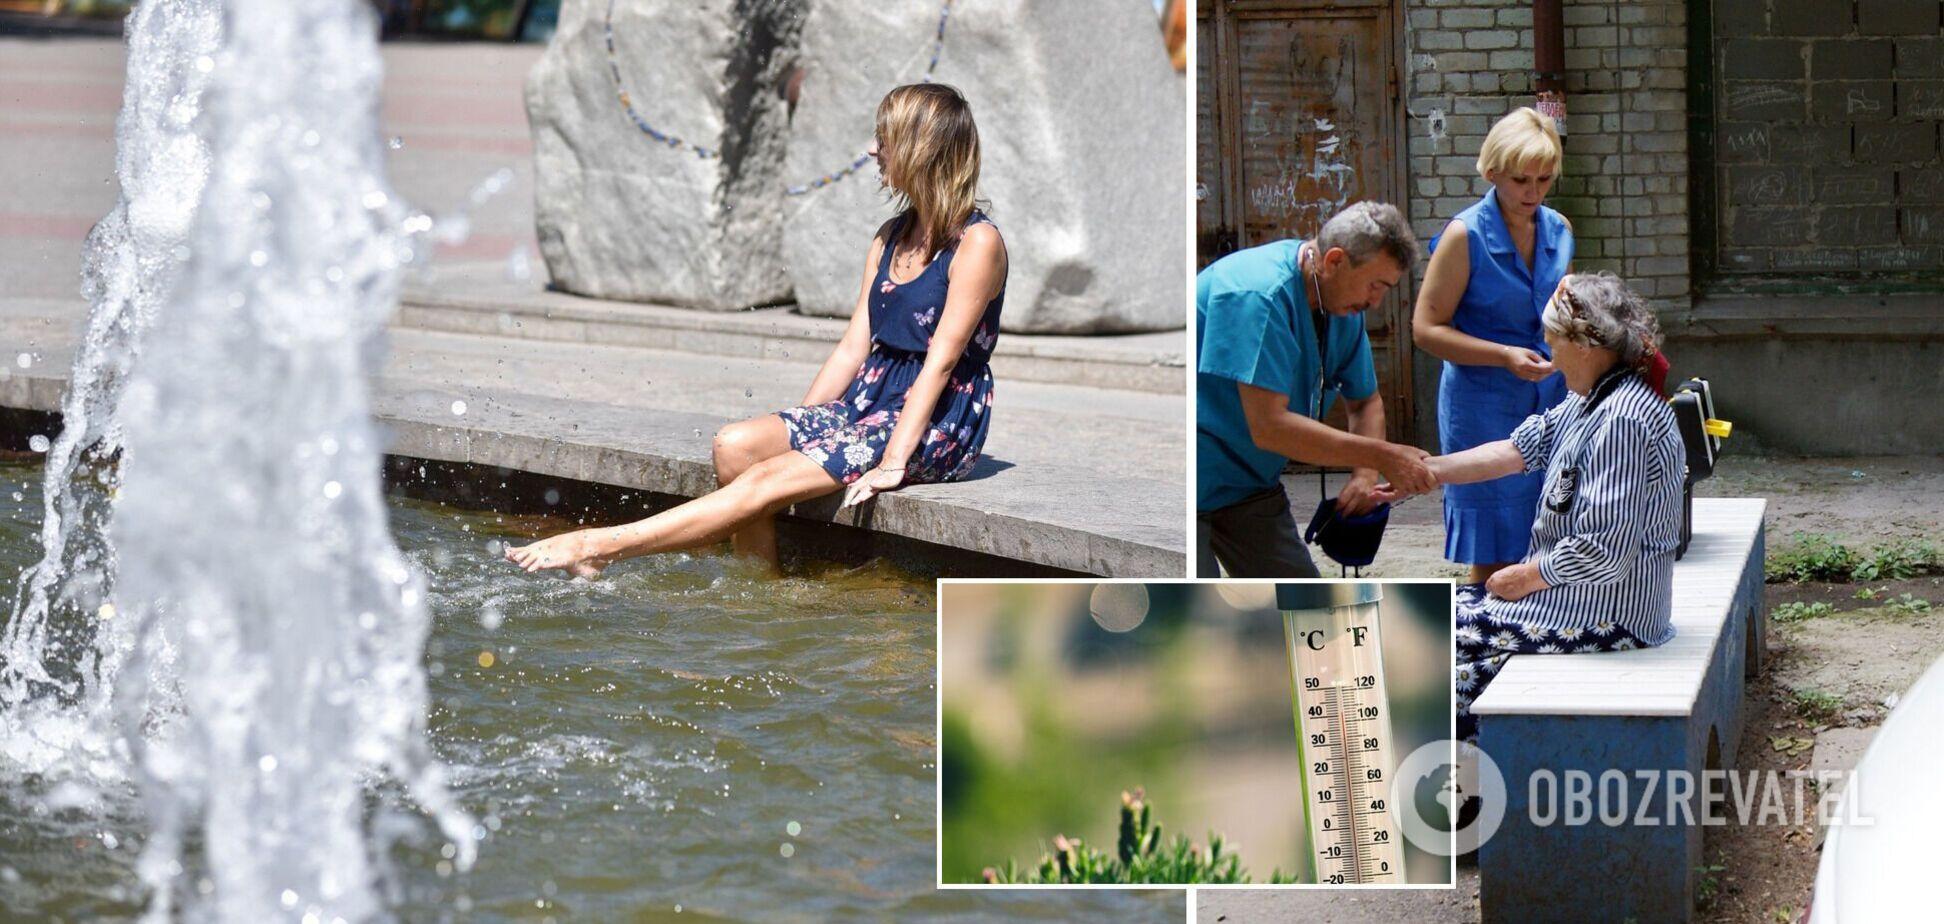 Как спастись от жары